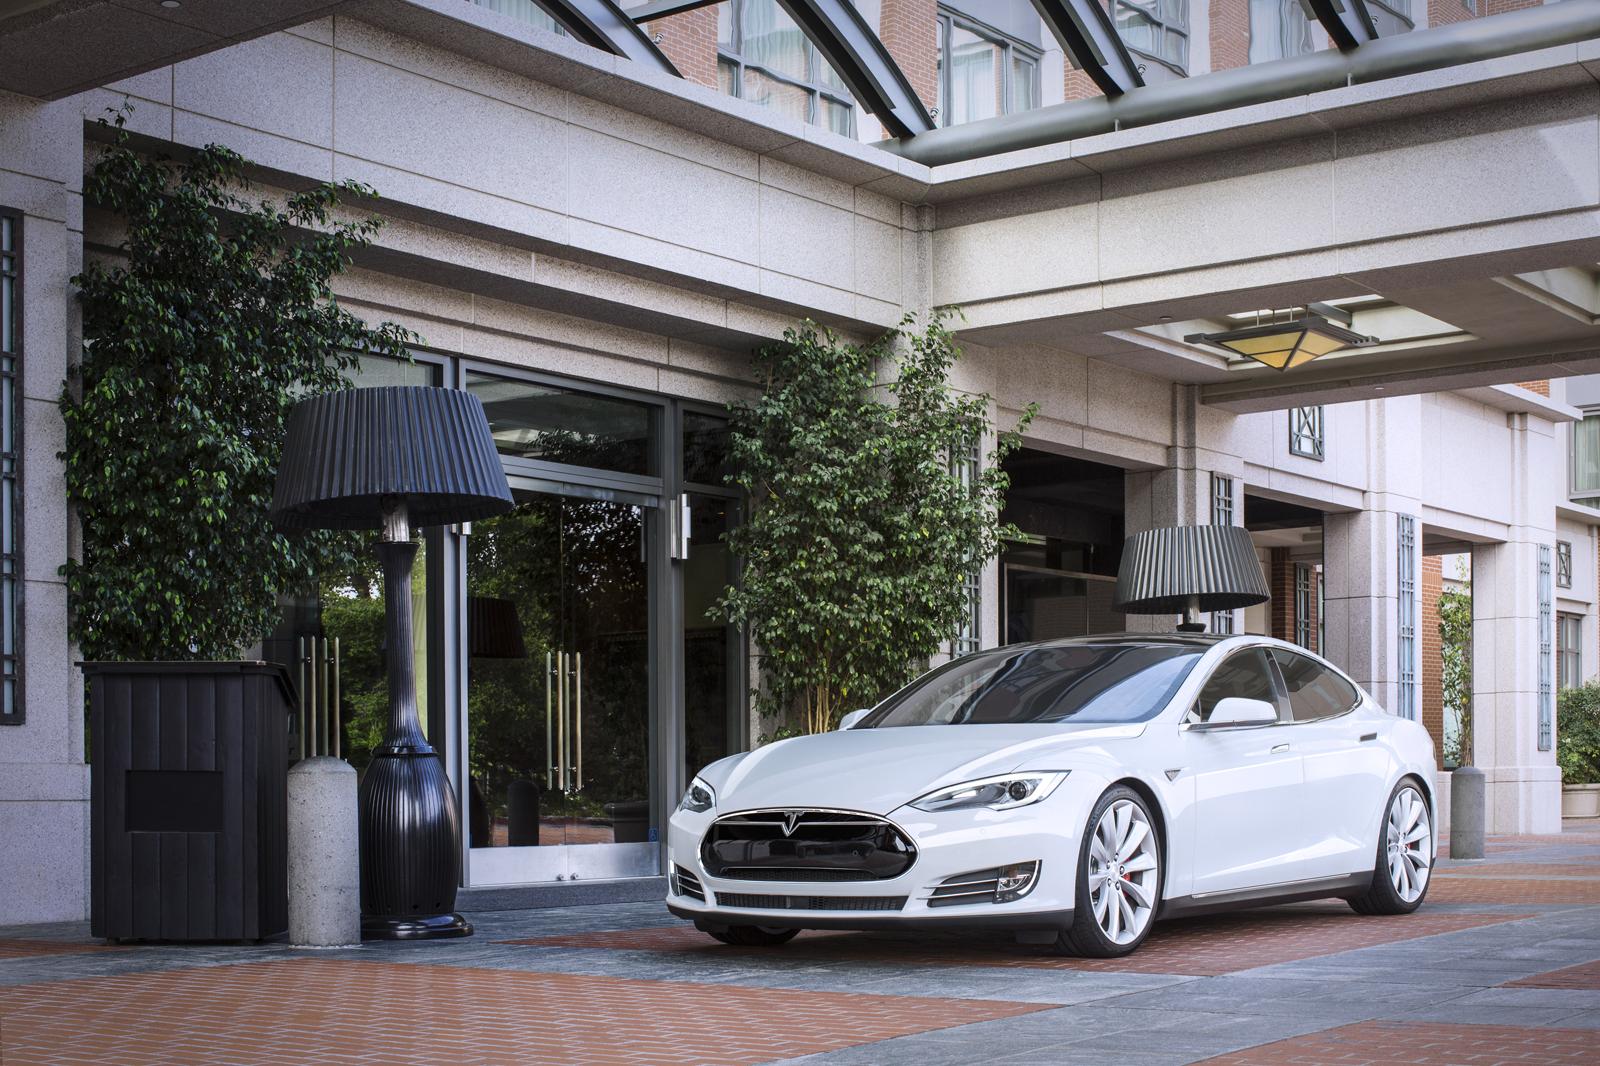 Photo Retouching-Tesla-Digital Imaging Group LLC - Digital ...